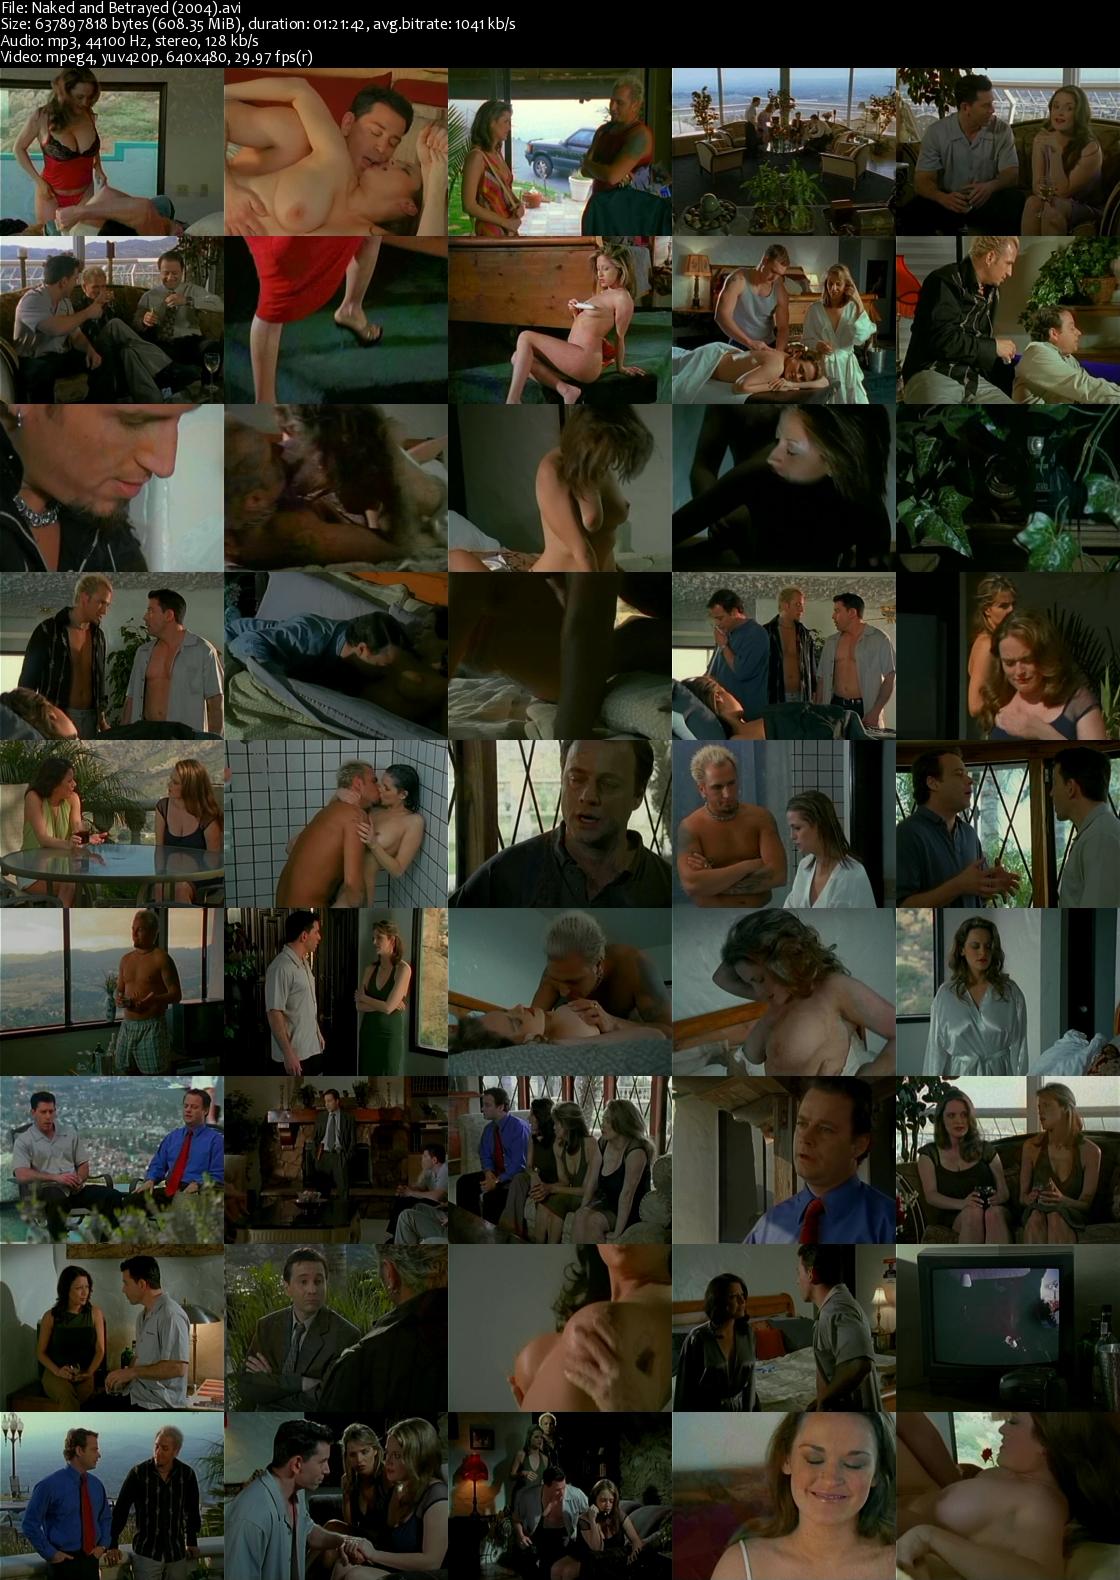 naked_and_betrayed_2004